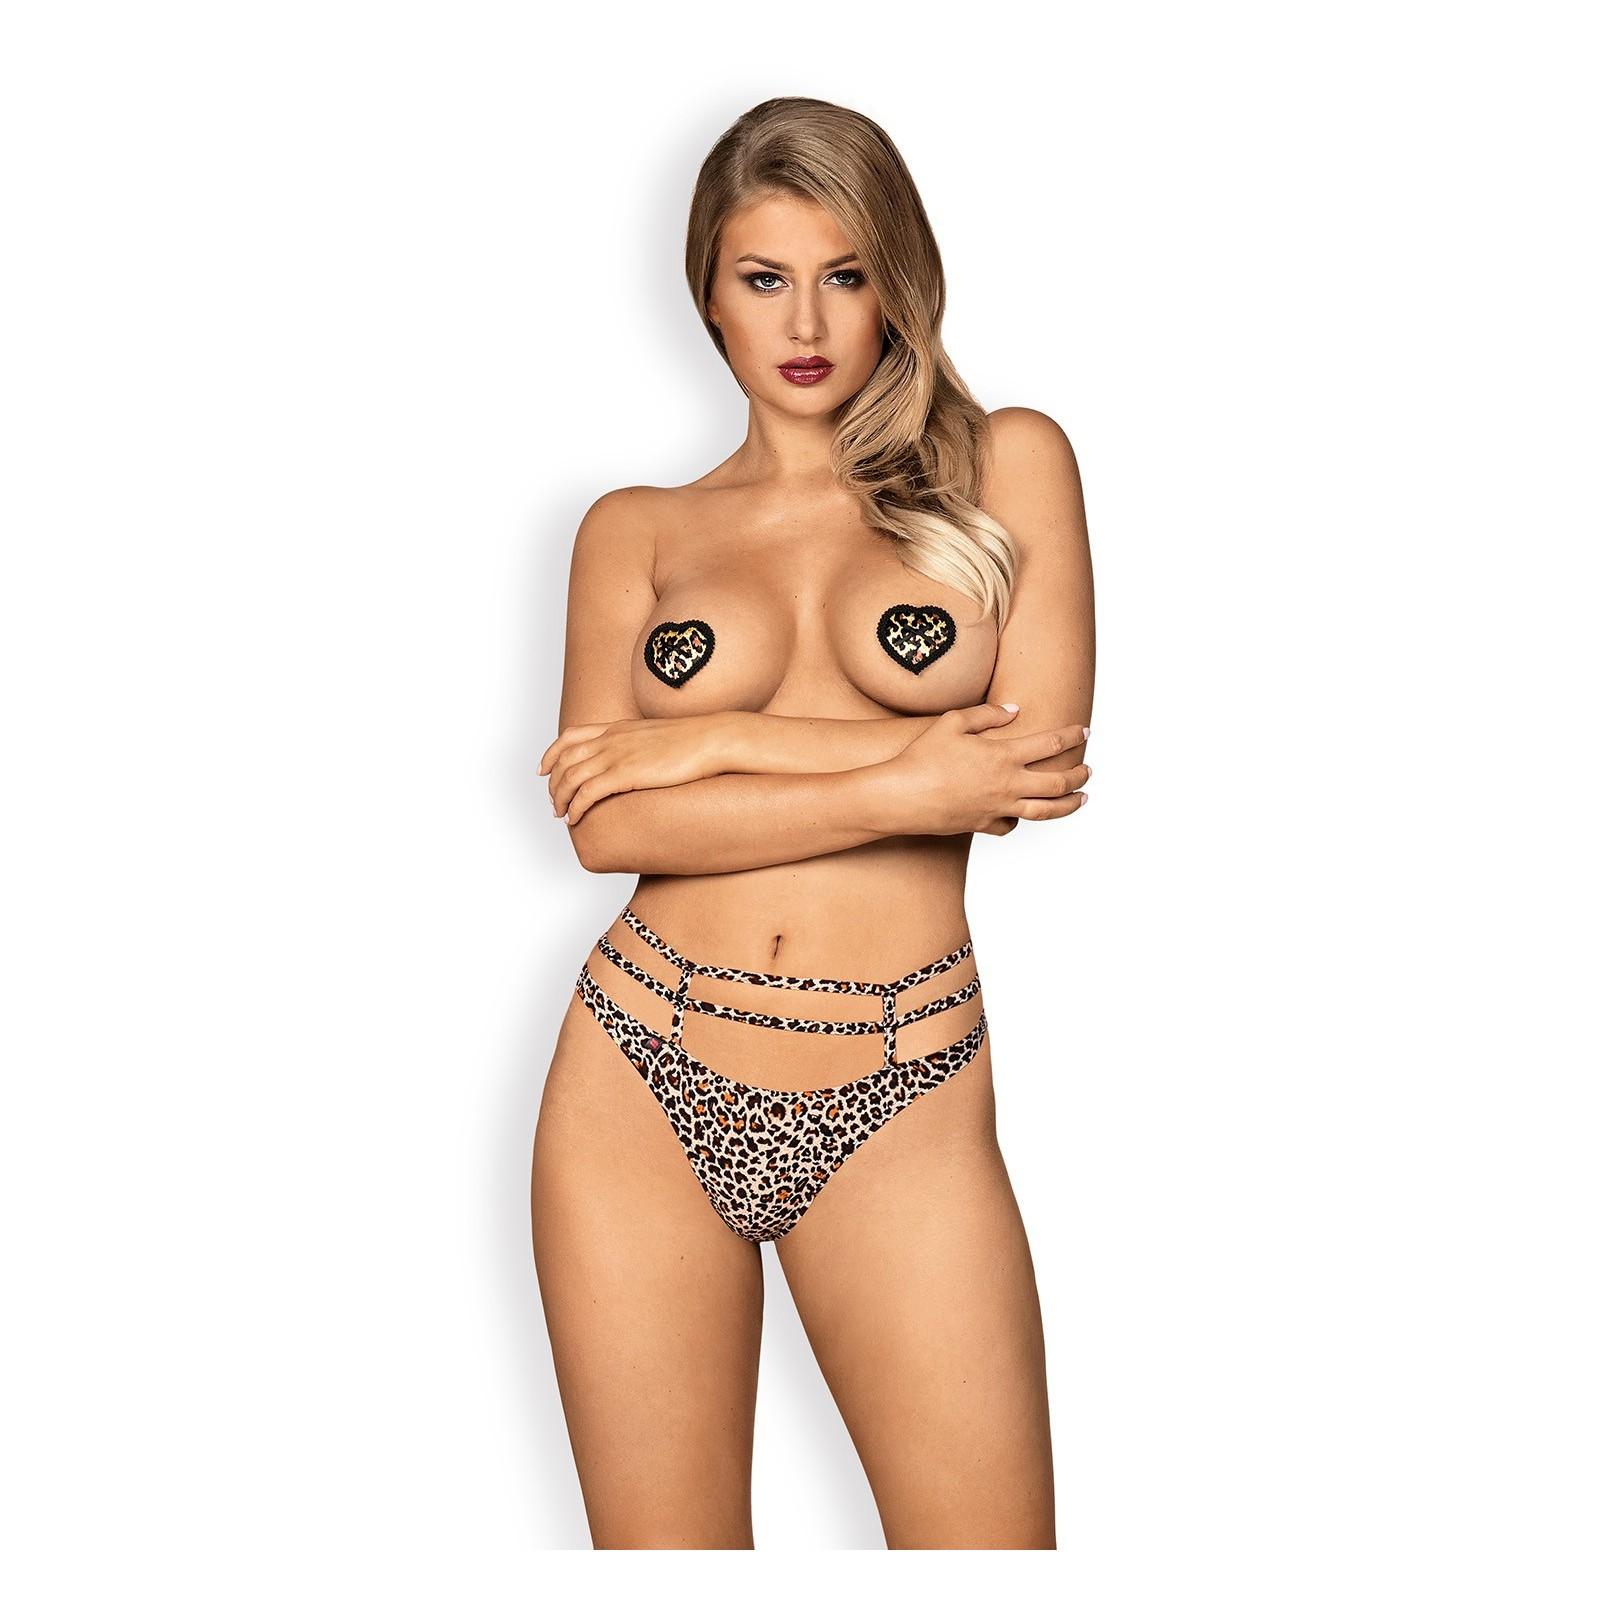 Selvy Nipple Covers - 2 - Vorschaubild